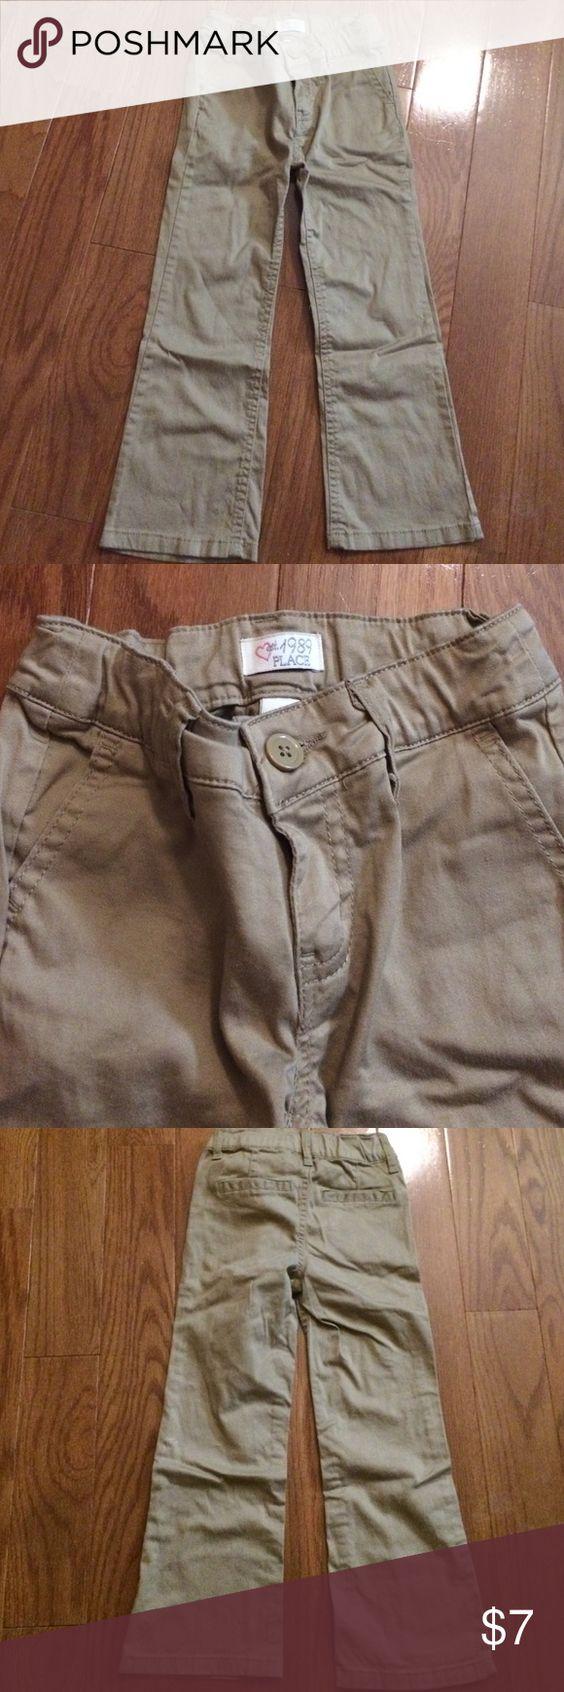 Khaki pants Khakis. Adjustable waistband. Worn 1x. Great for a school uniform. Children's Place Bottoms Casual